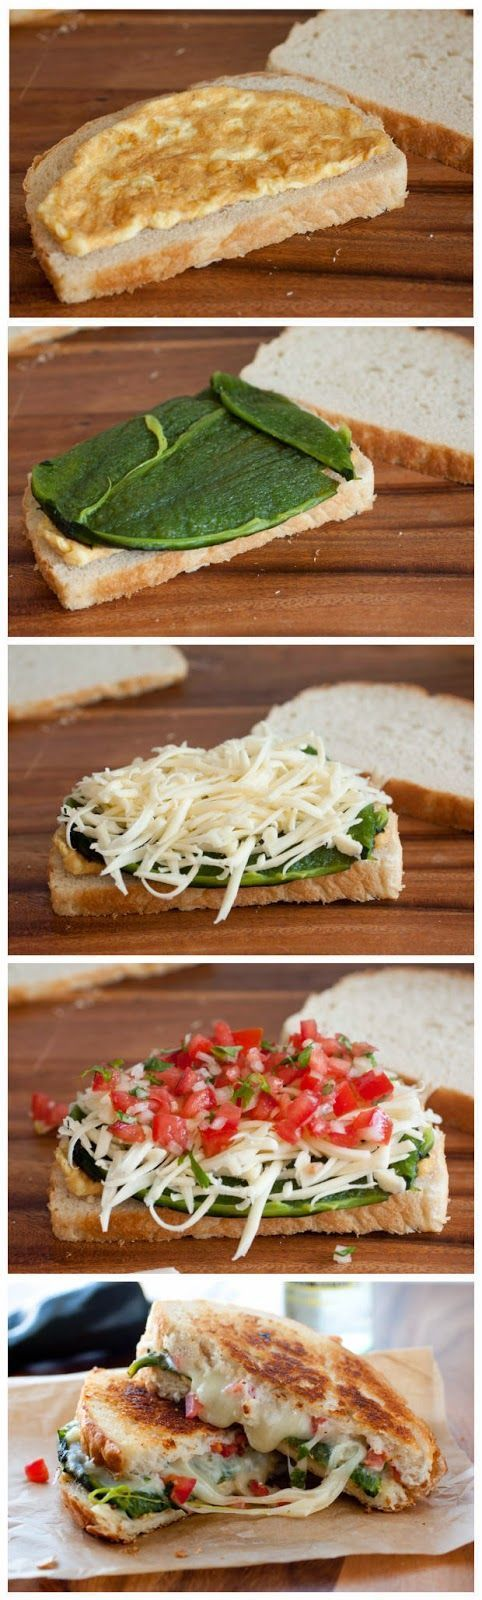 Sano sandwich